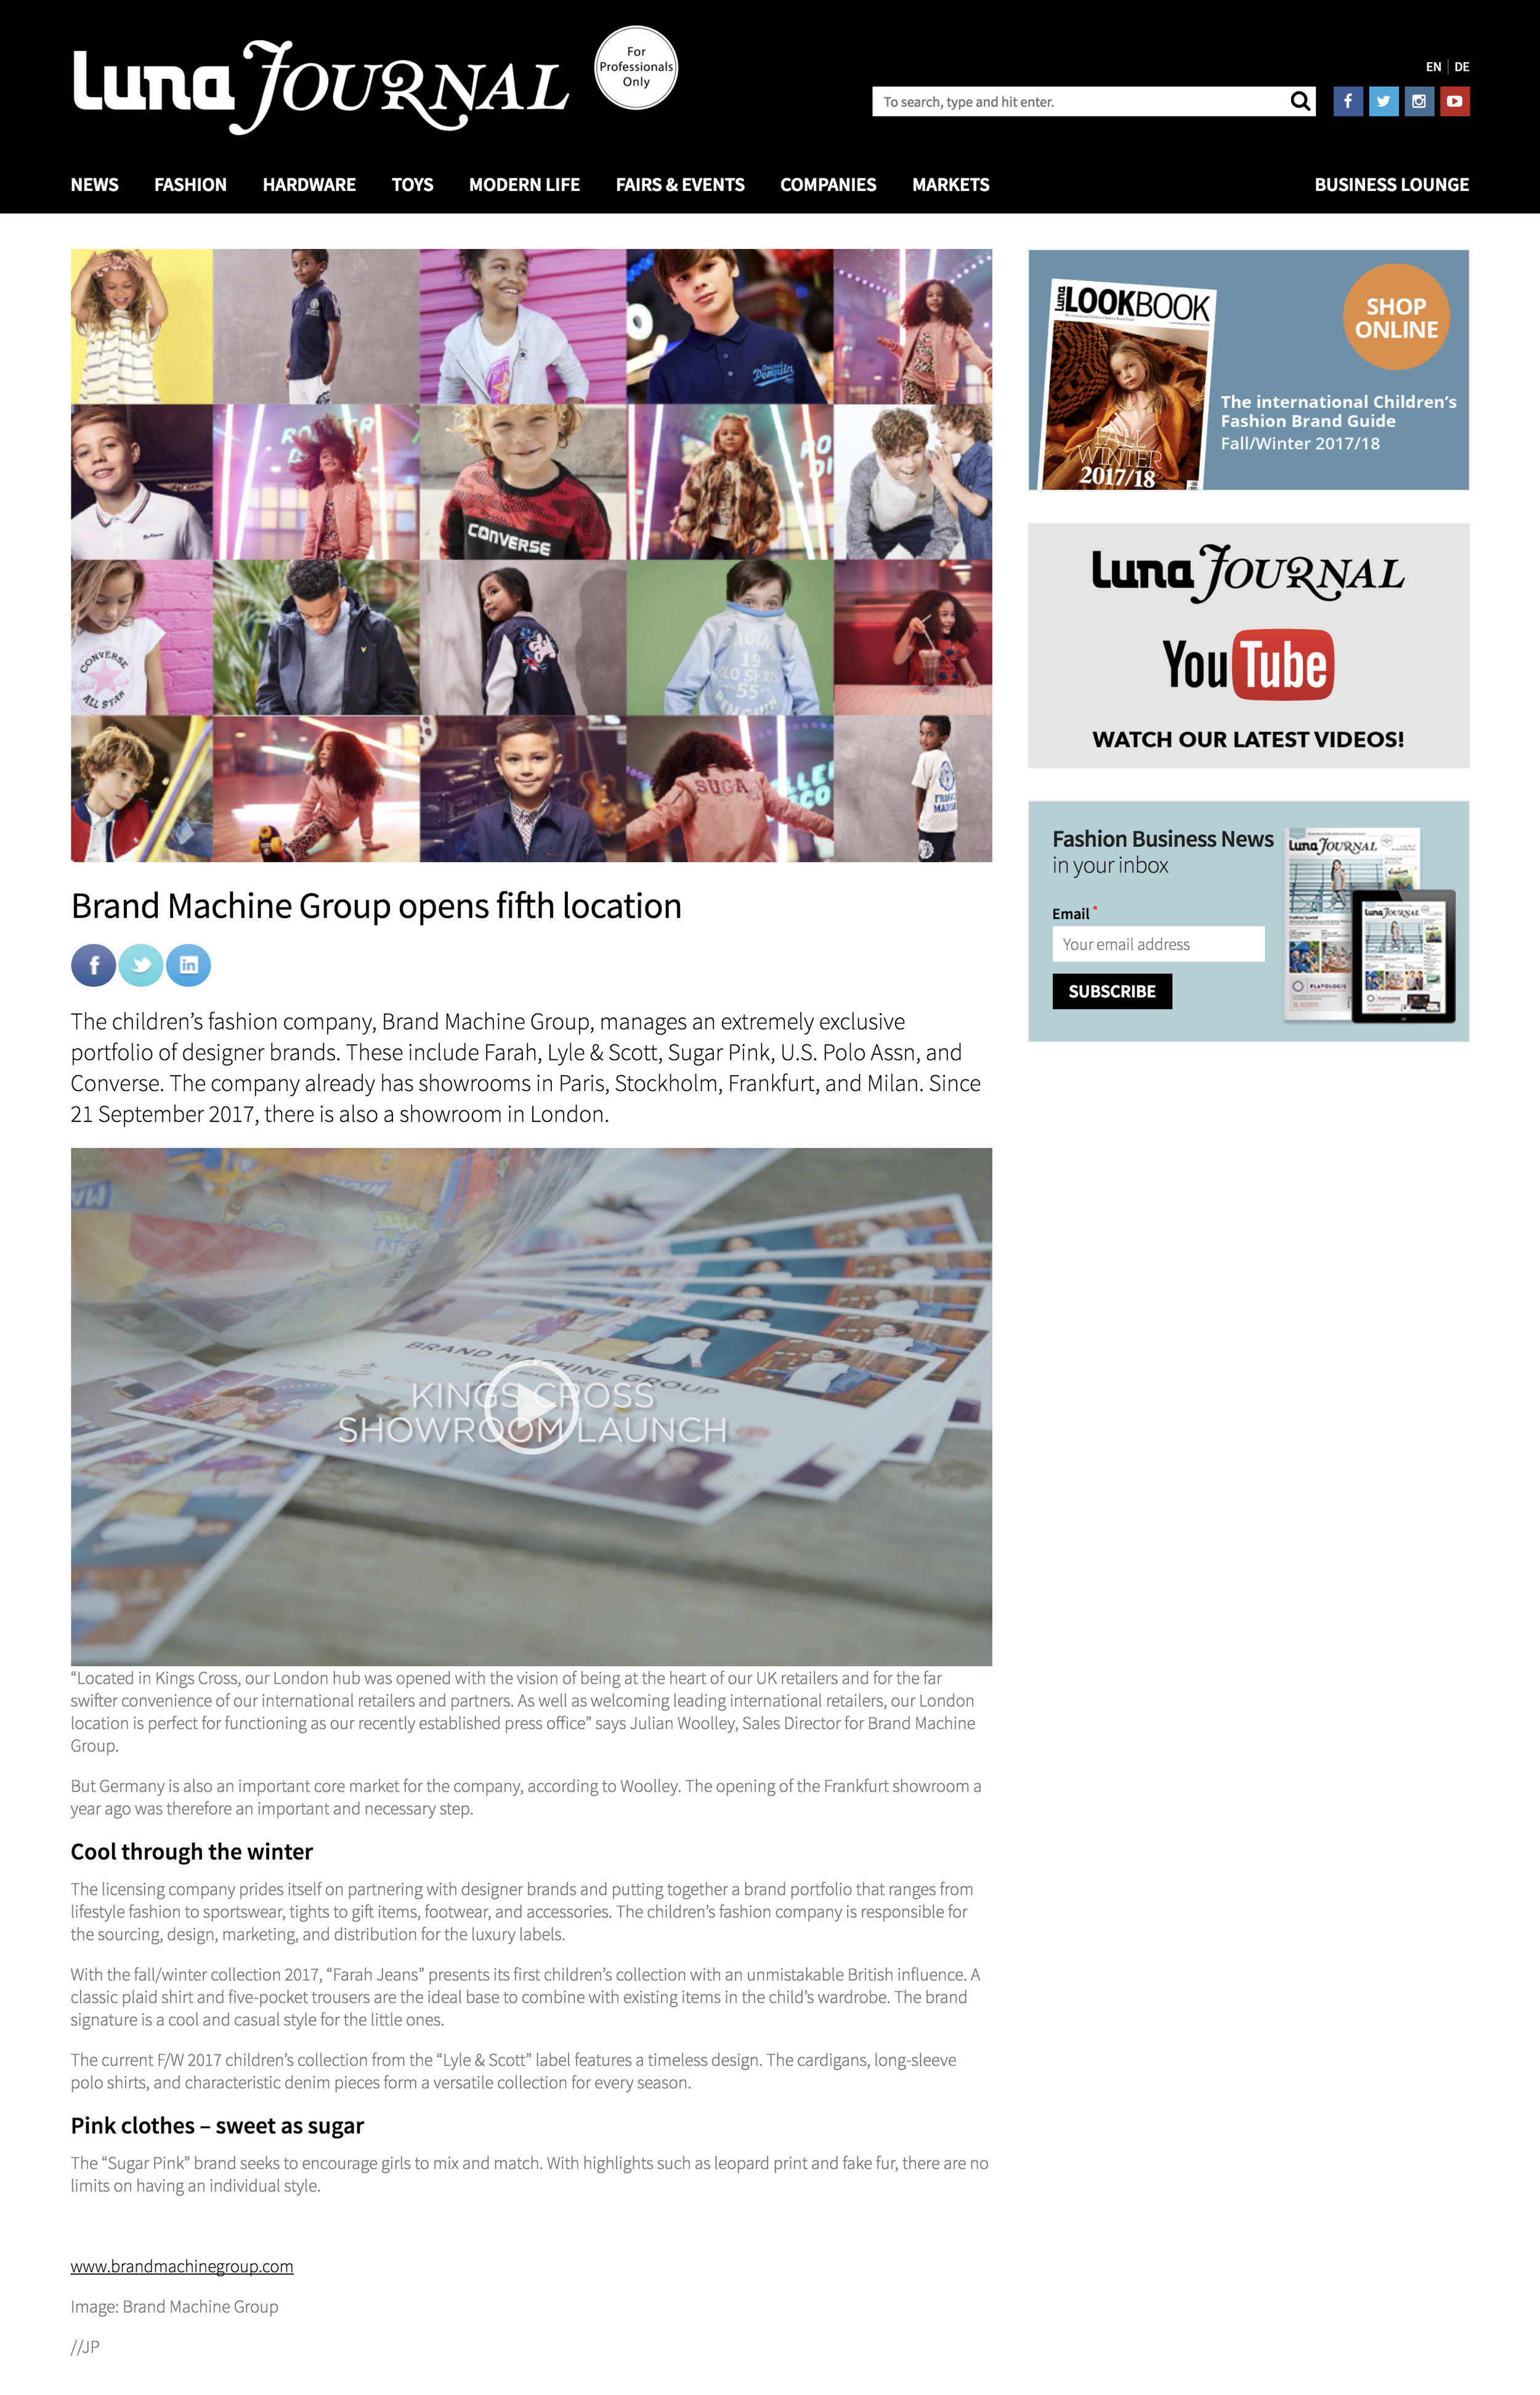 02.11.12_Luna Journal_BMG Showrooms_Online.jpg